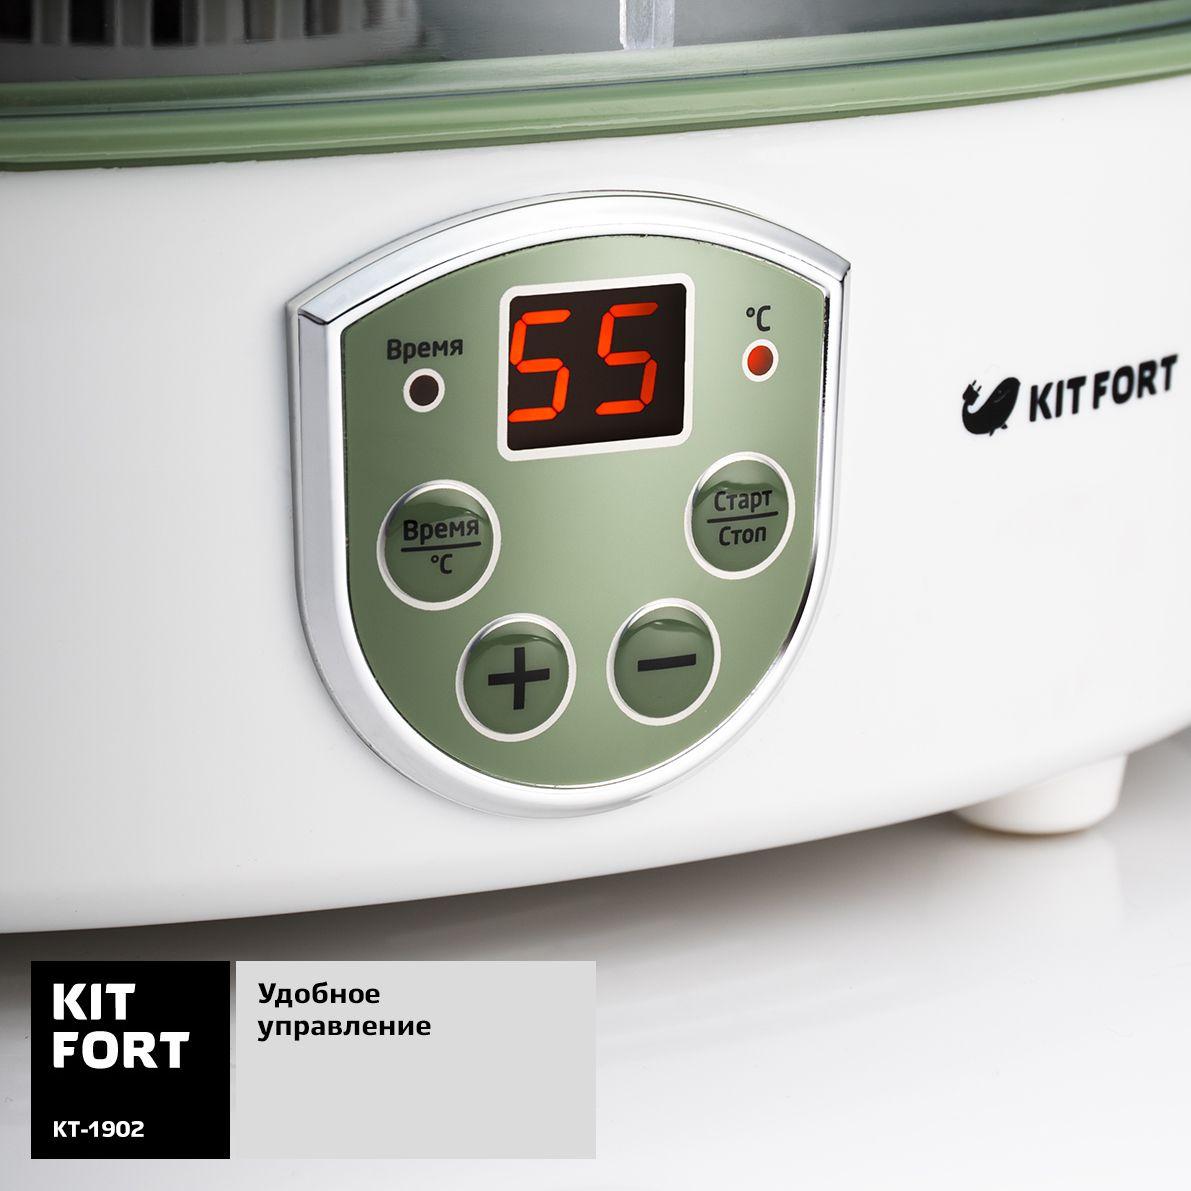 Дегидратор Kitfort КТ-1902, White Kitfort